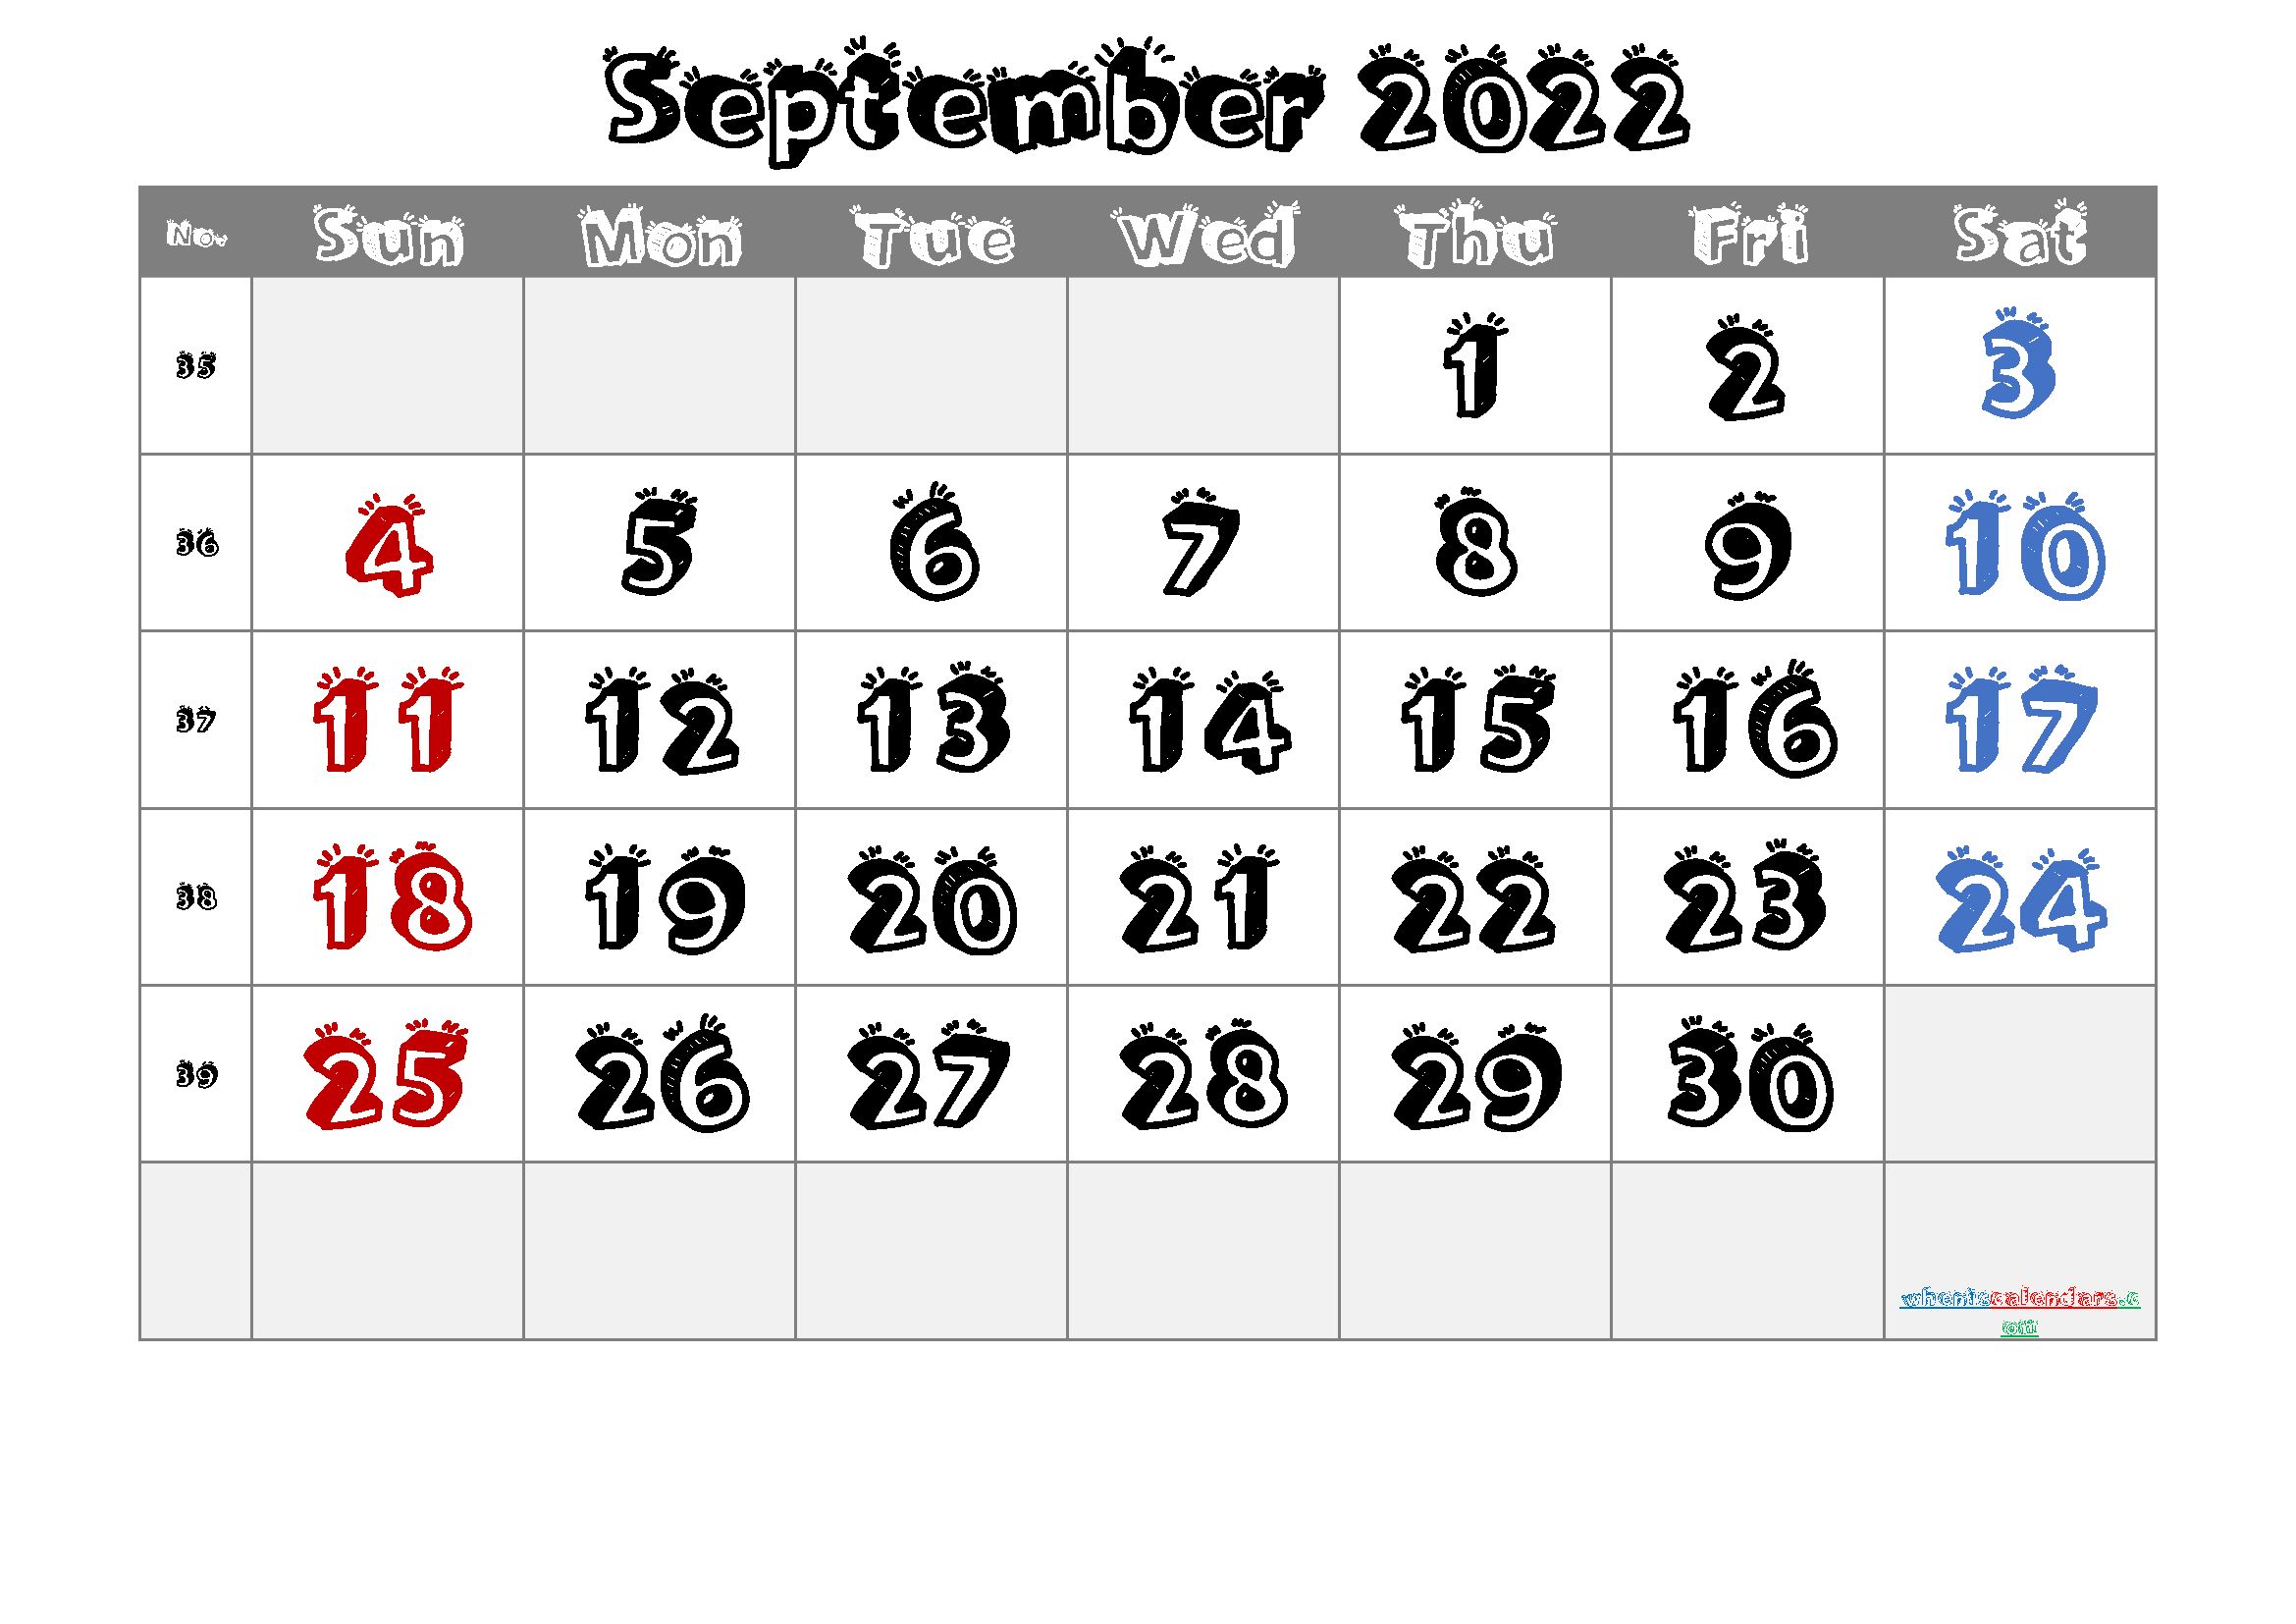 Free Printable September 2022 Calendar within September 2022 Calendar Template Photo